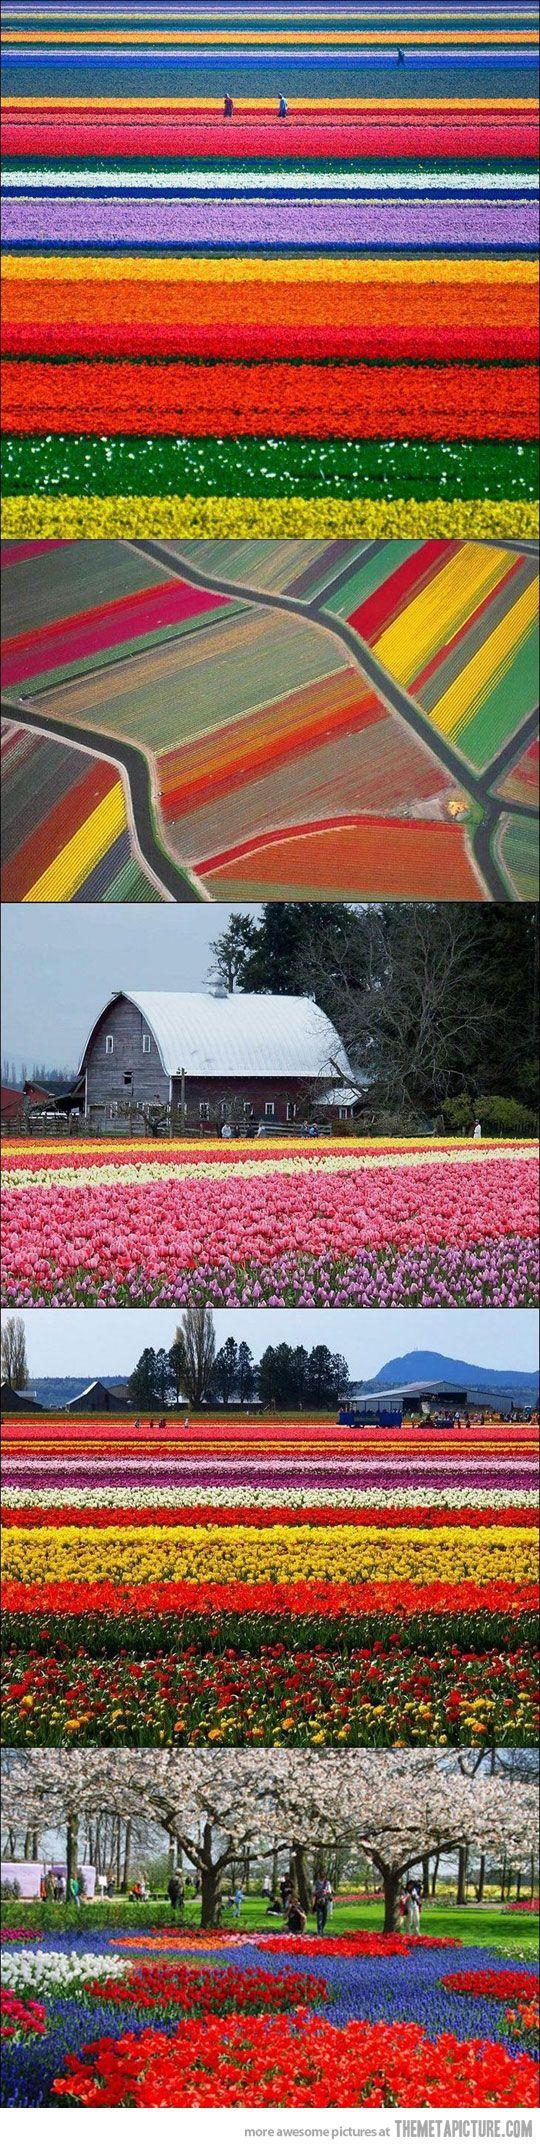 Netherland's fields